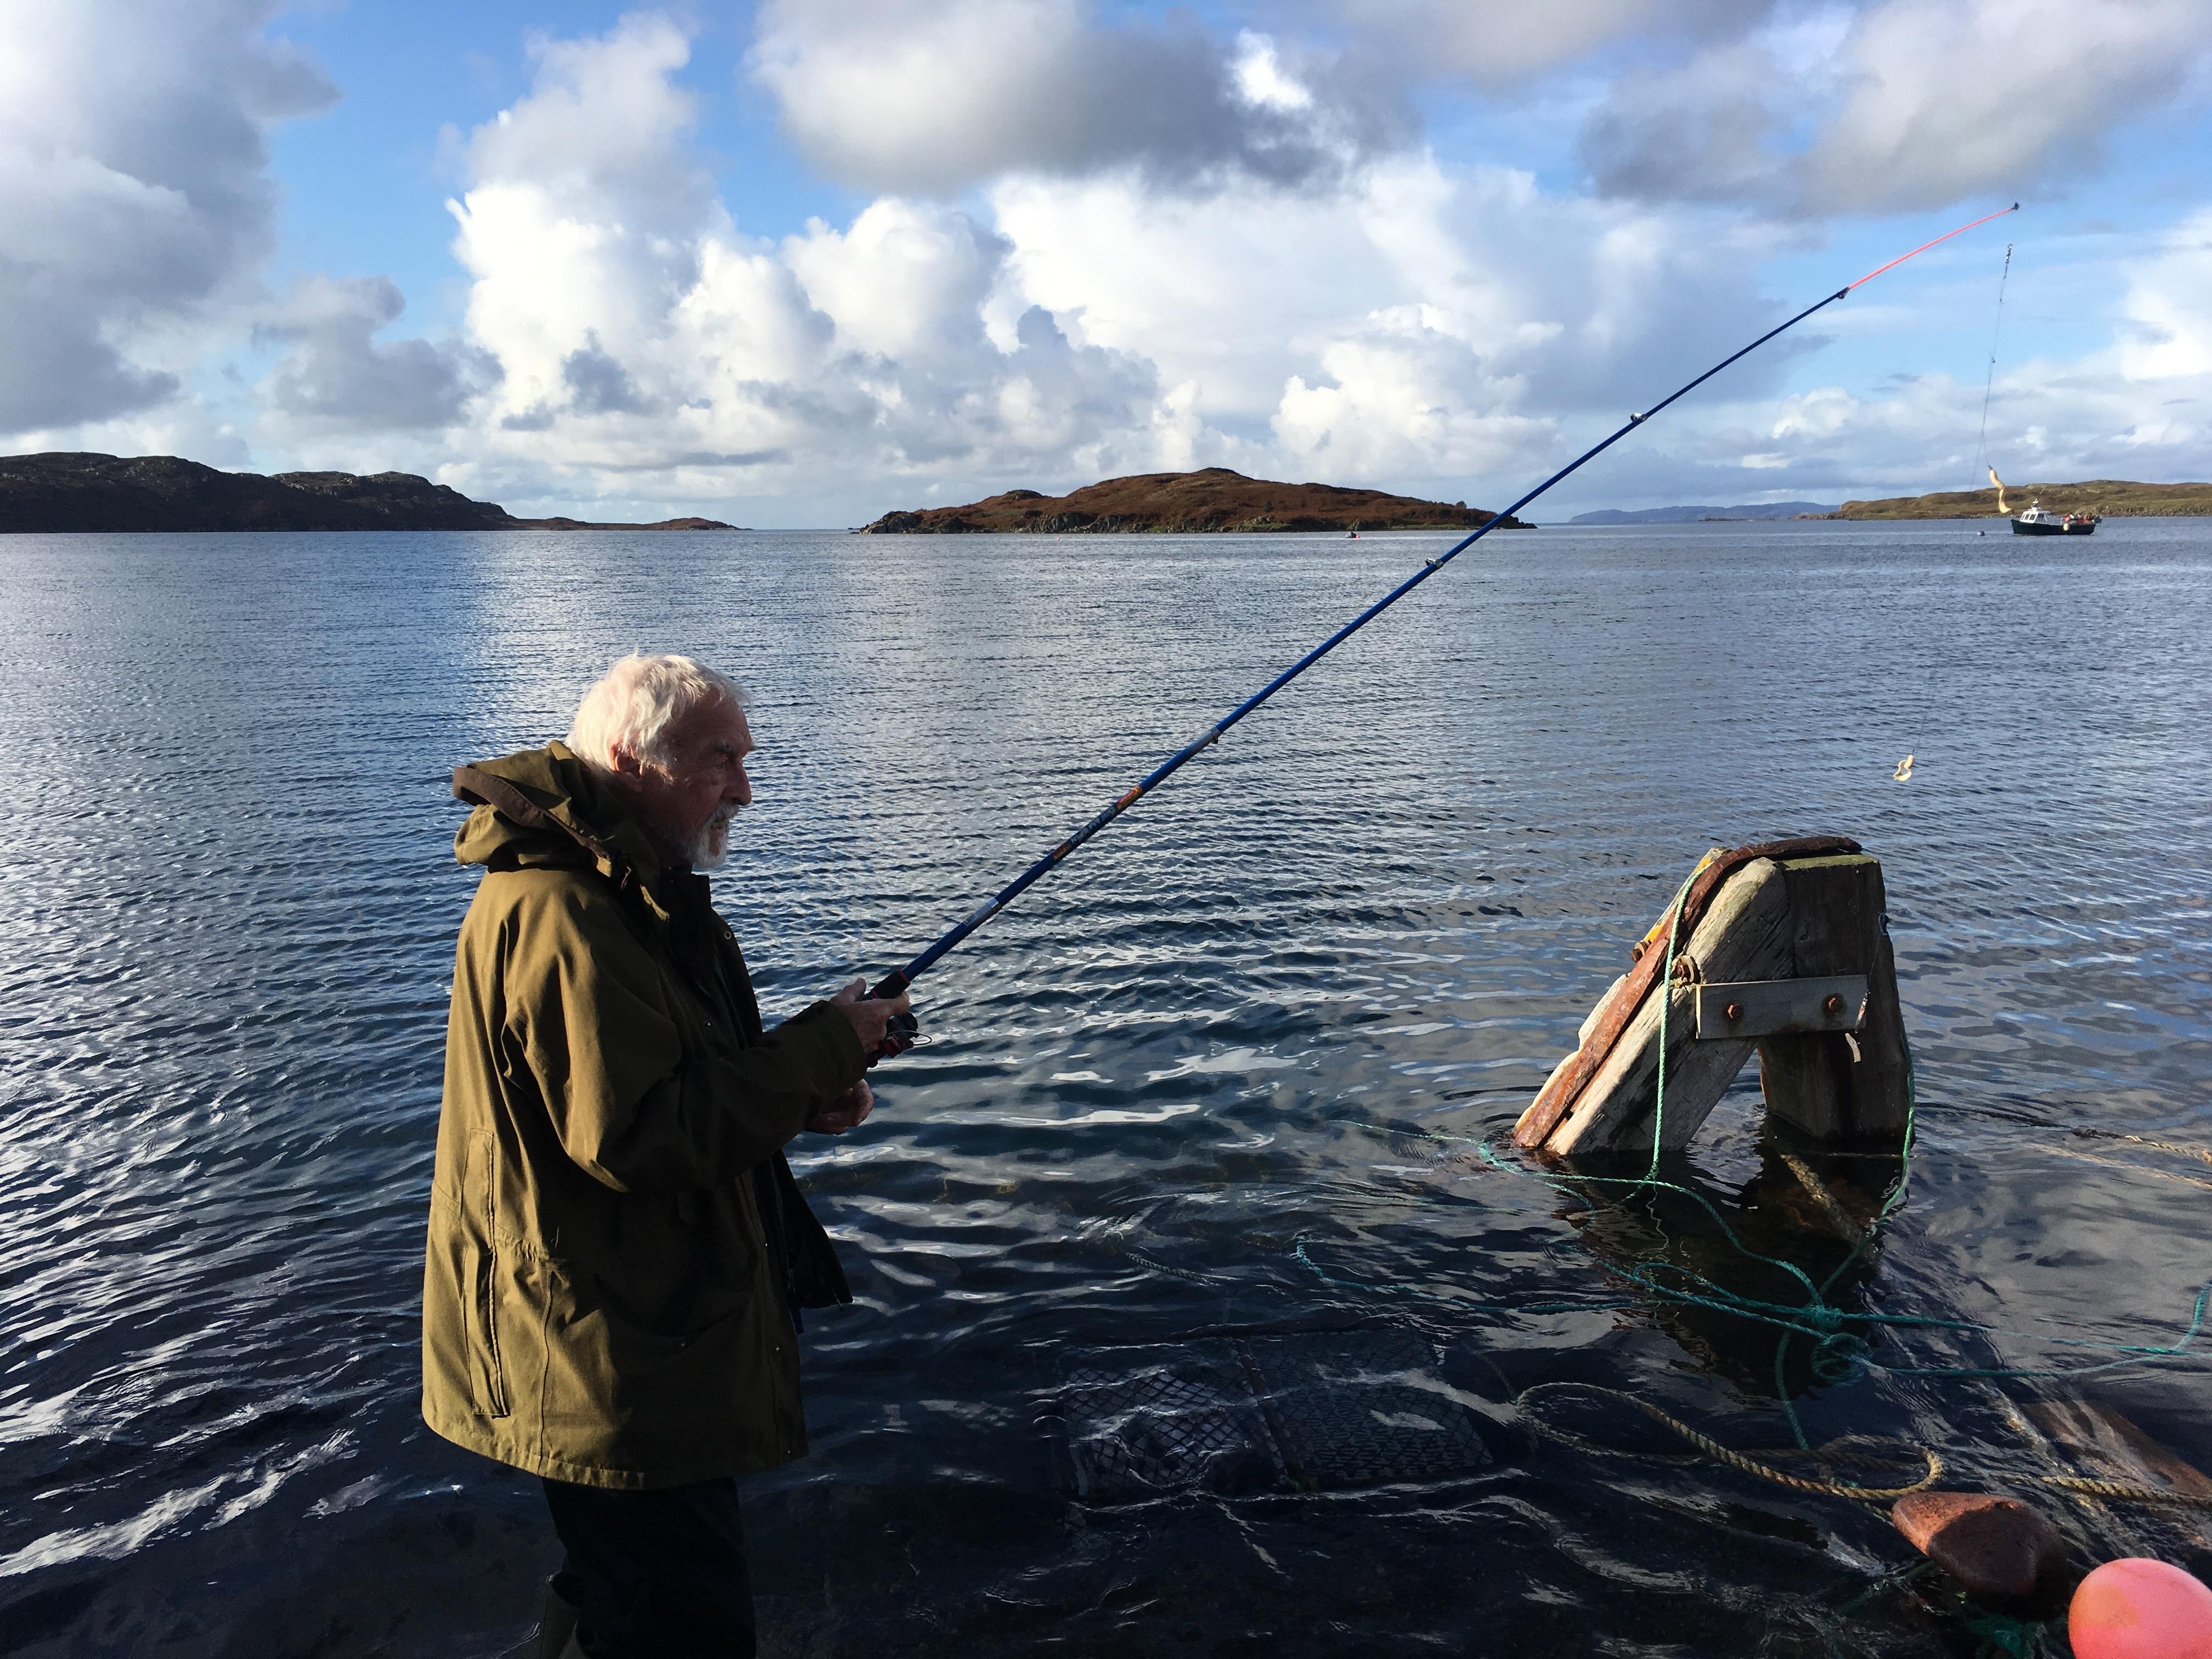 Charles Moseley | Iona Blog | Mull | Fishing | Mackerel | Columba | Cambridge Writer.